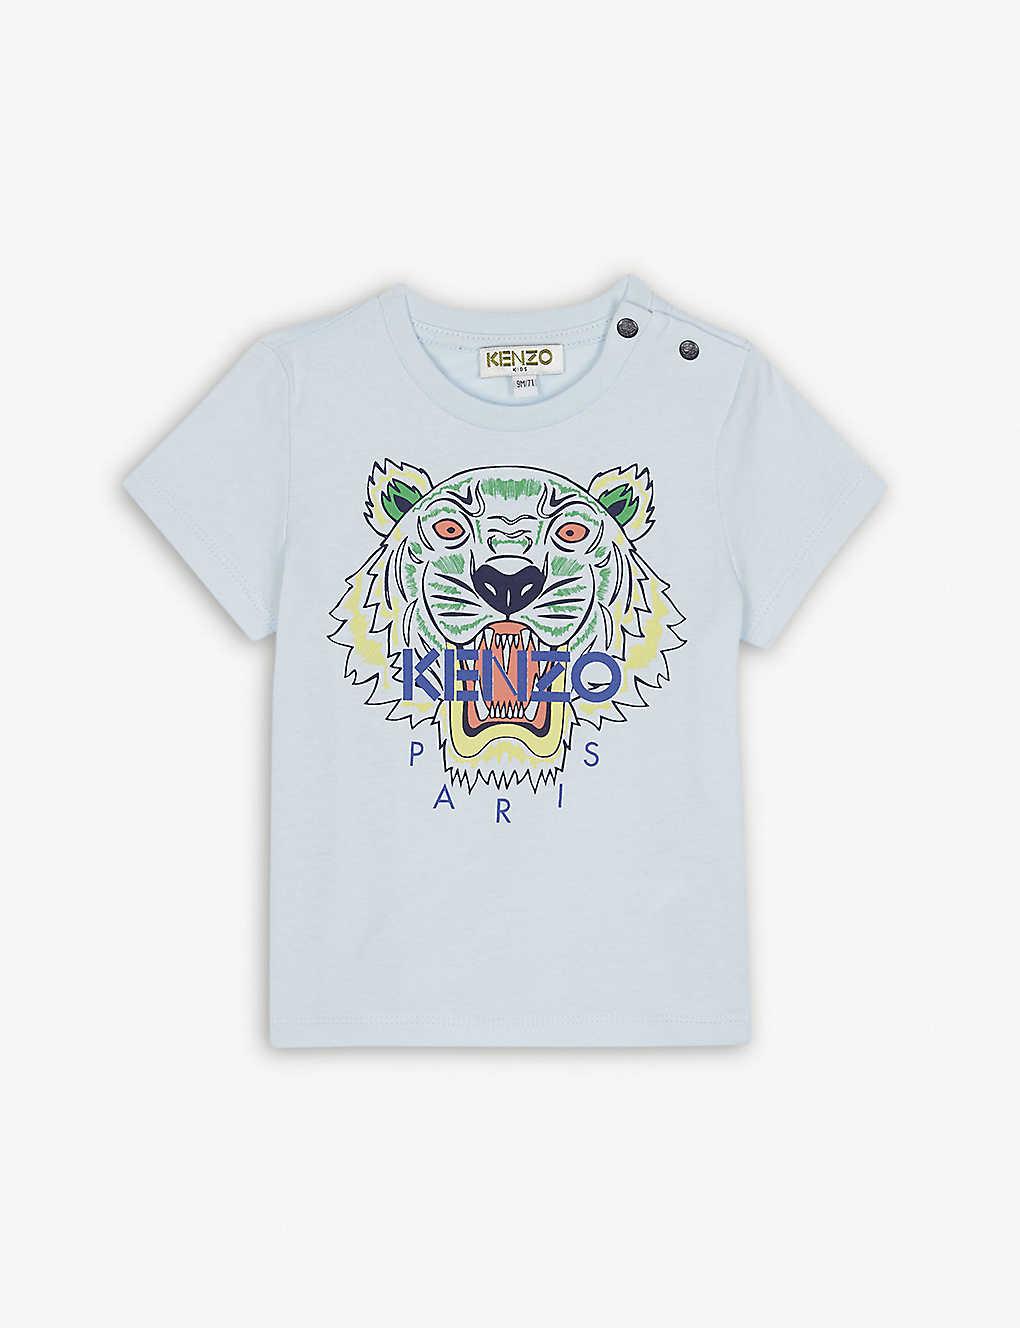 6ed4cba6f KENZO - Tiger print cotton T-shirt 3-18 months   Selfridges.com